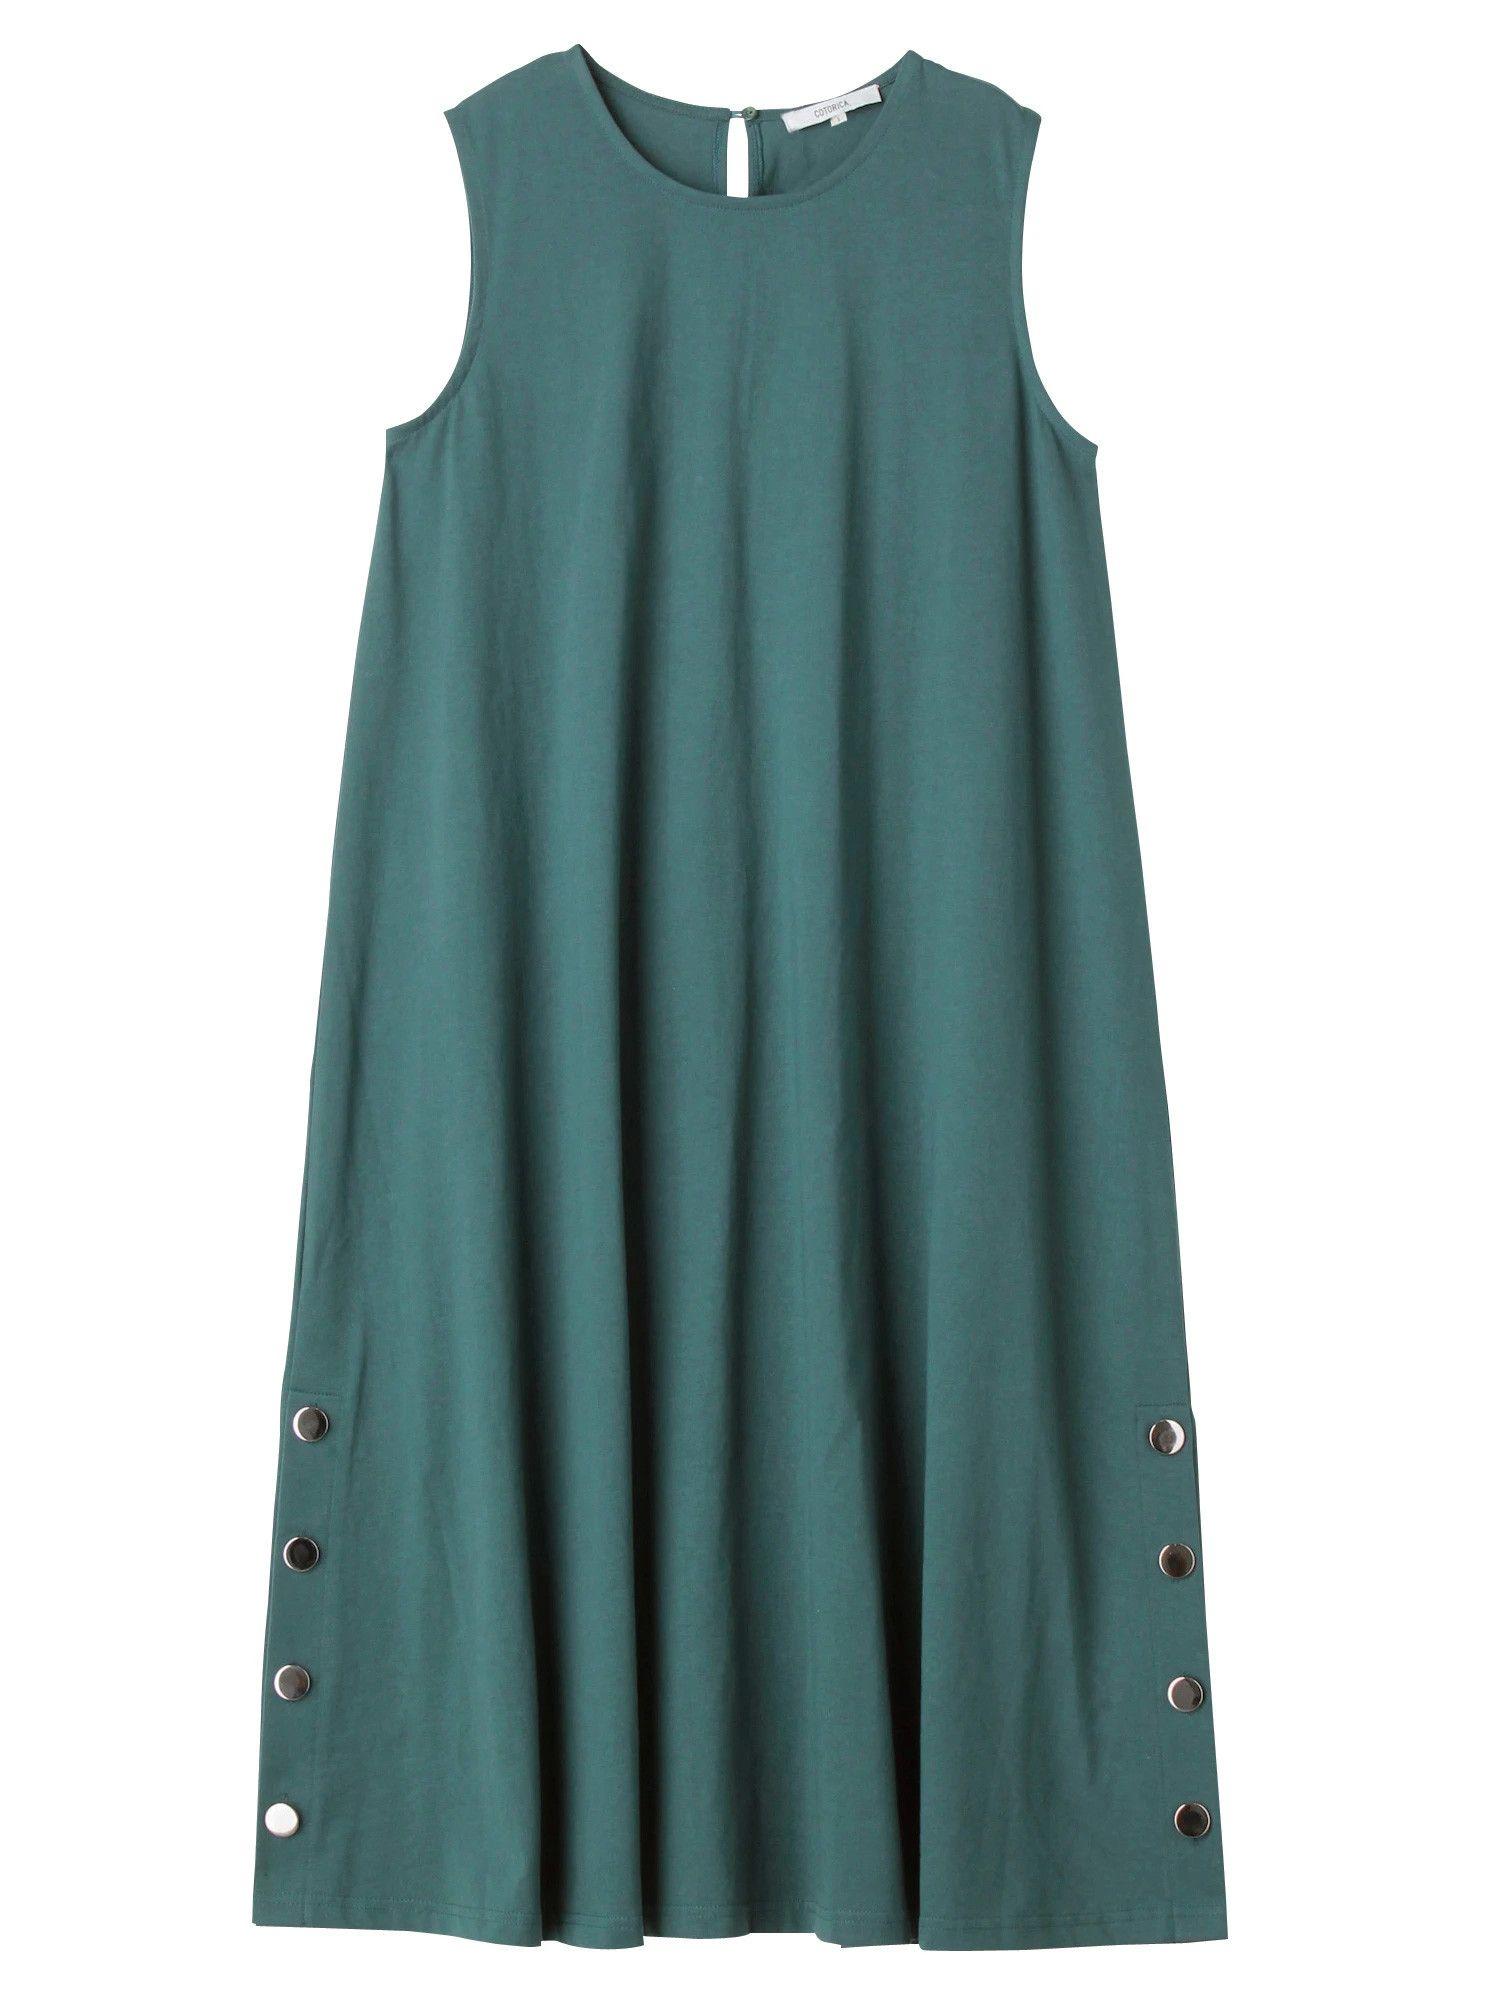 Silver button Long Dress